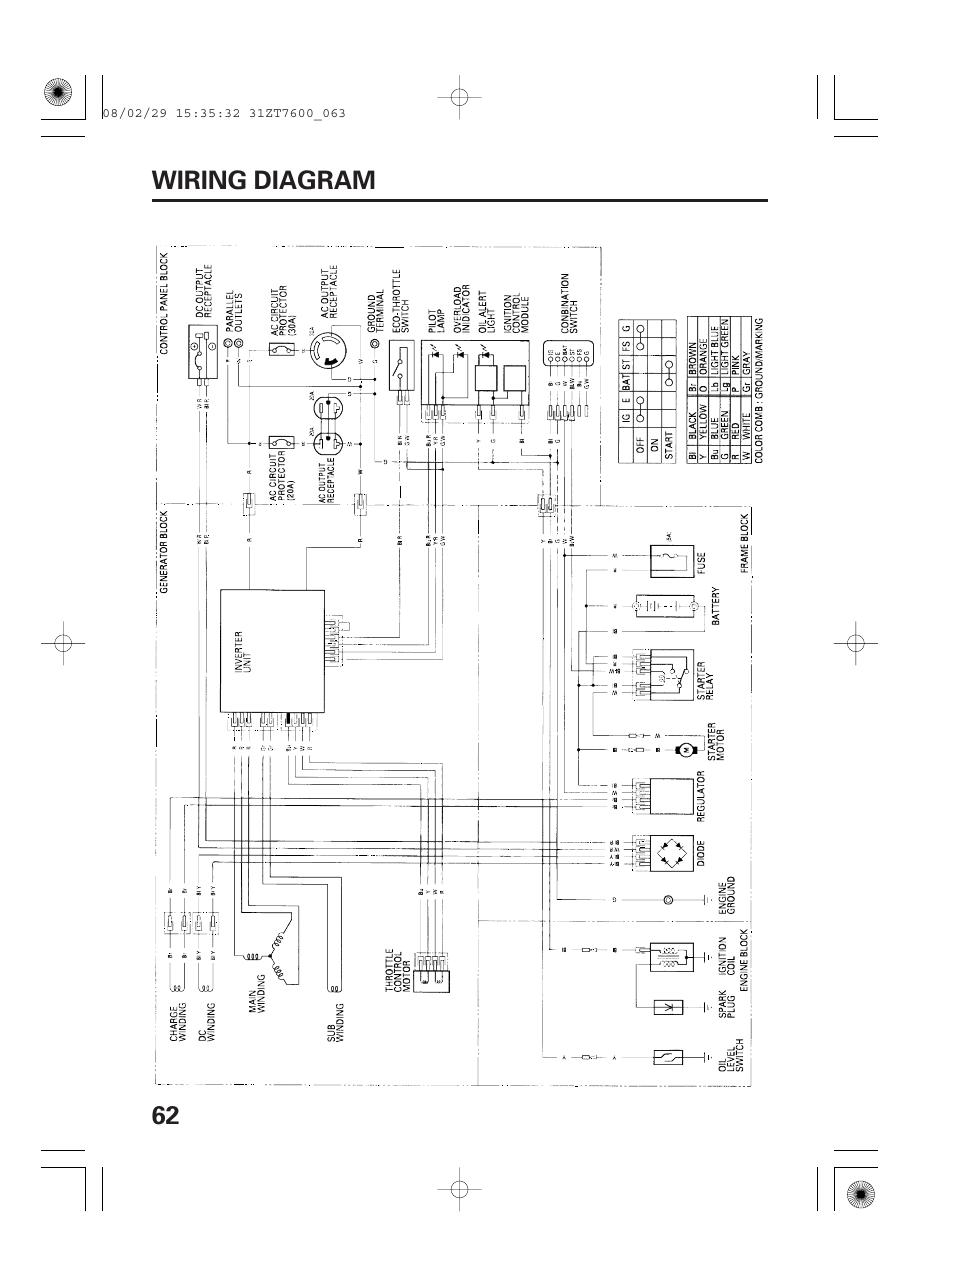 hight resolution of wiring diagram 62 wiring diagram honda eu3000is user manualwiring diagram 62 wiring diagram honda